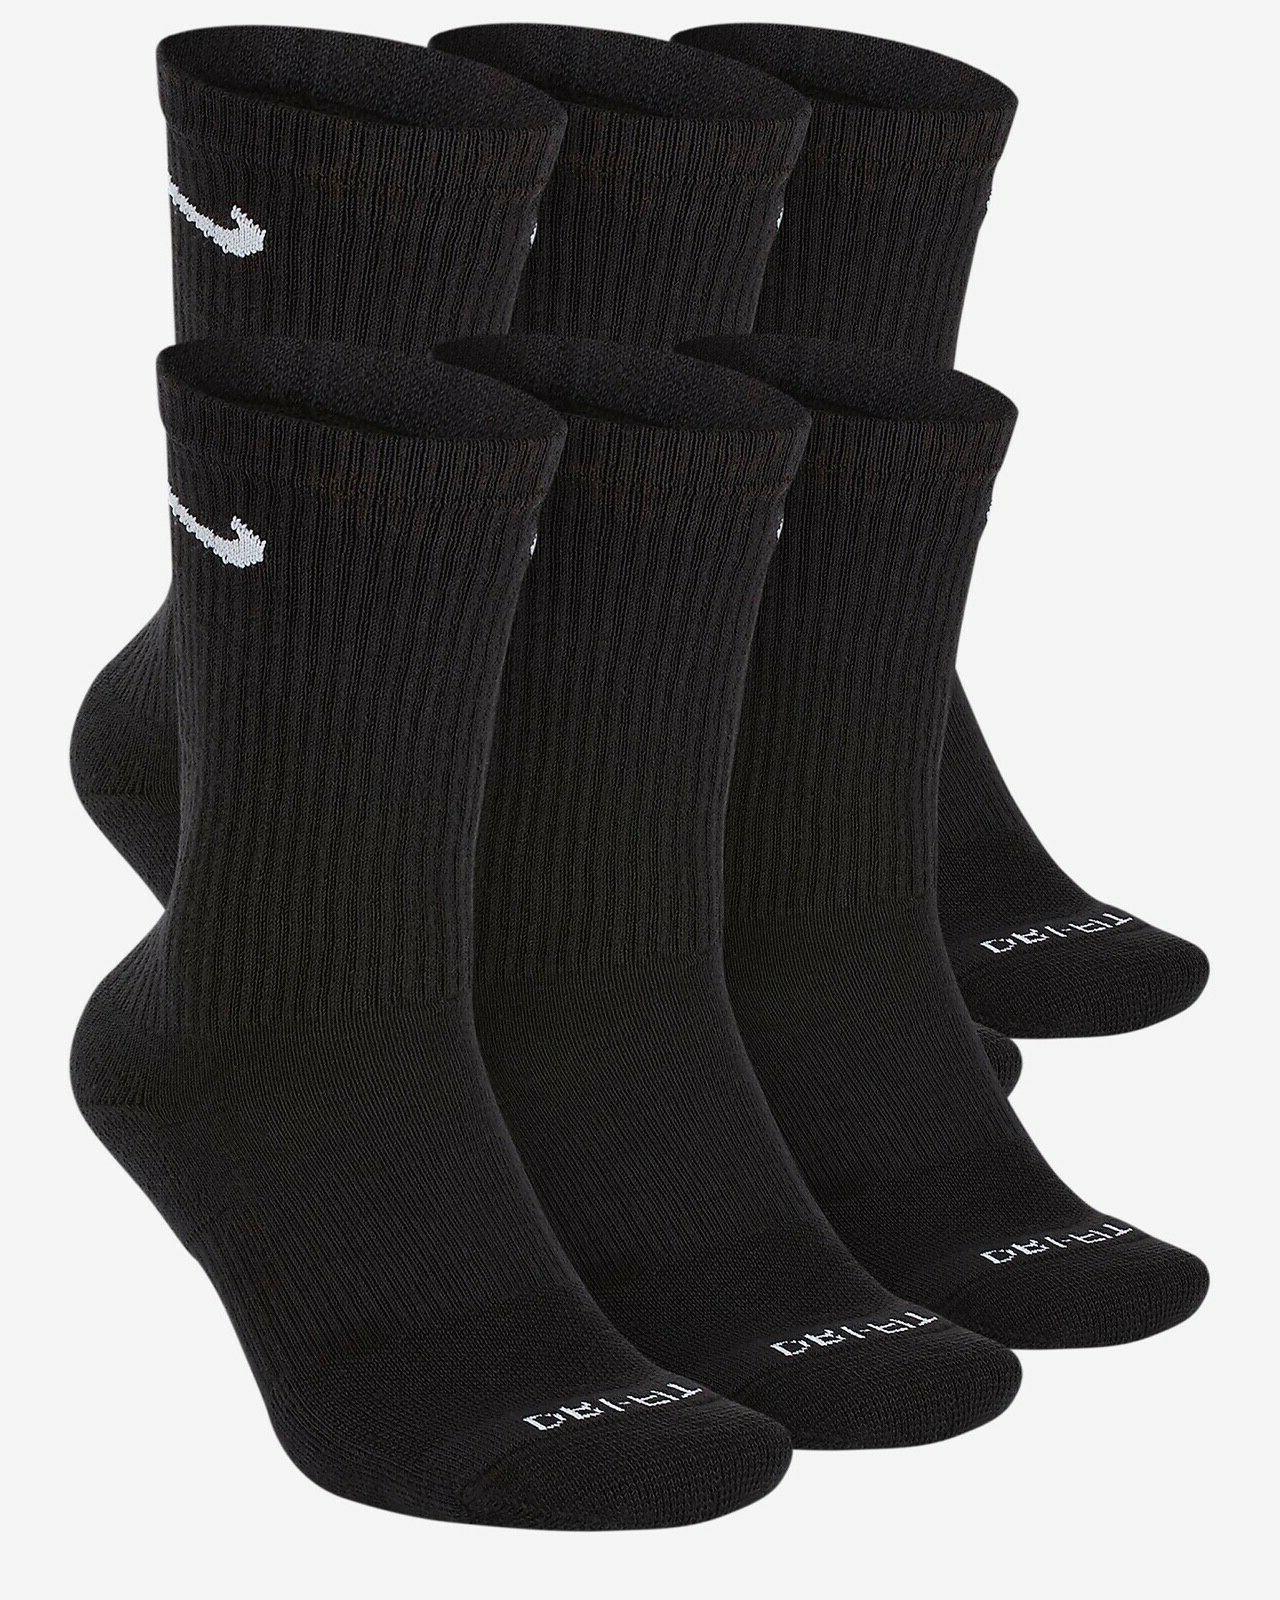 Nike Dri-Fit Cushioned Crew Socks Blue Camo White Black Larg